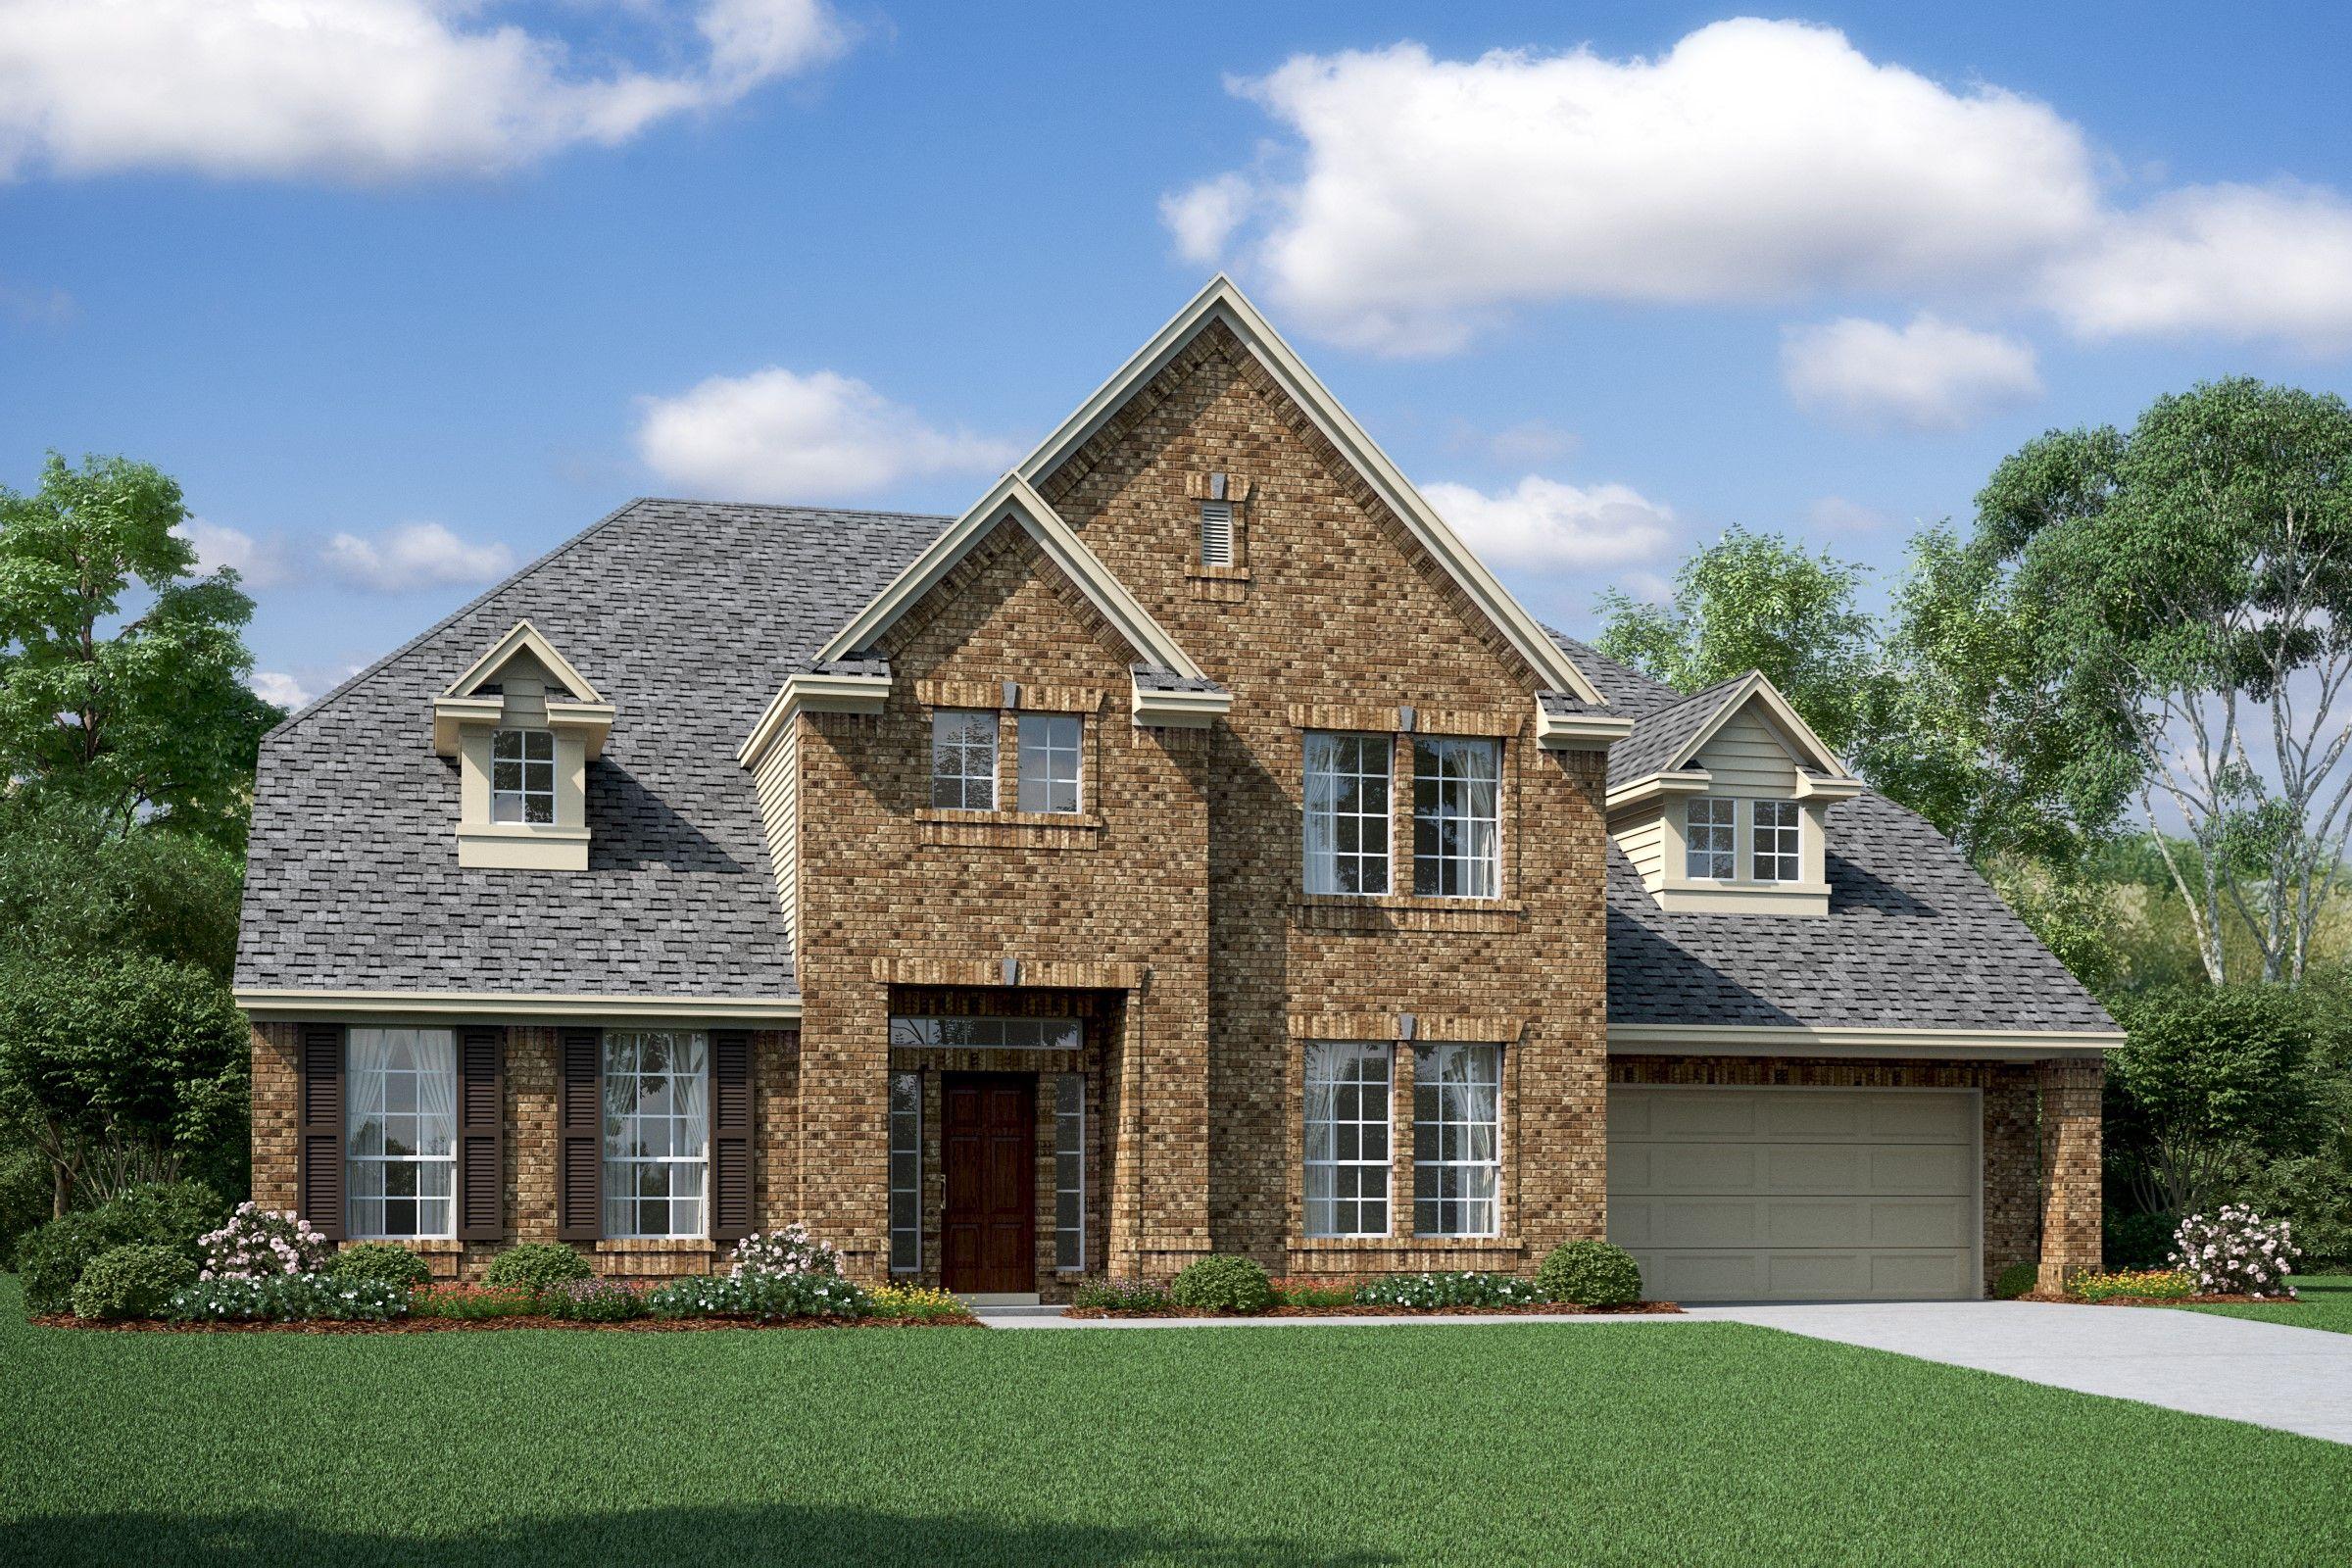 Single Family for Sale at Thunder Bay - Adaline Mccollum Park Rd & Thunder Bay Beach City, Texas 77523 United States